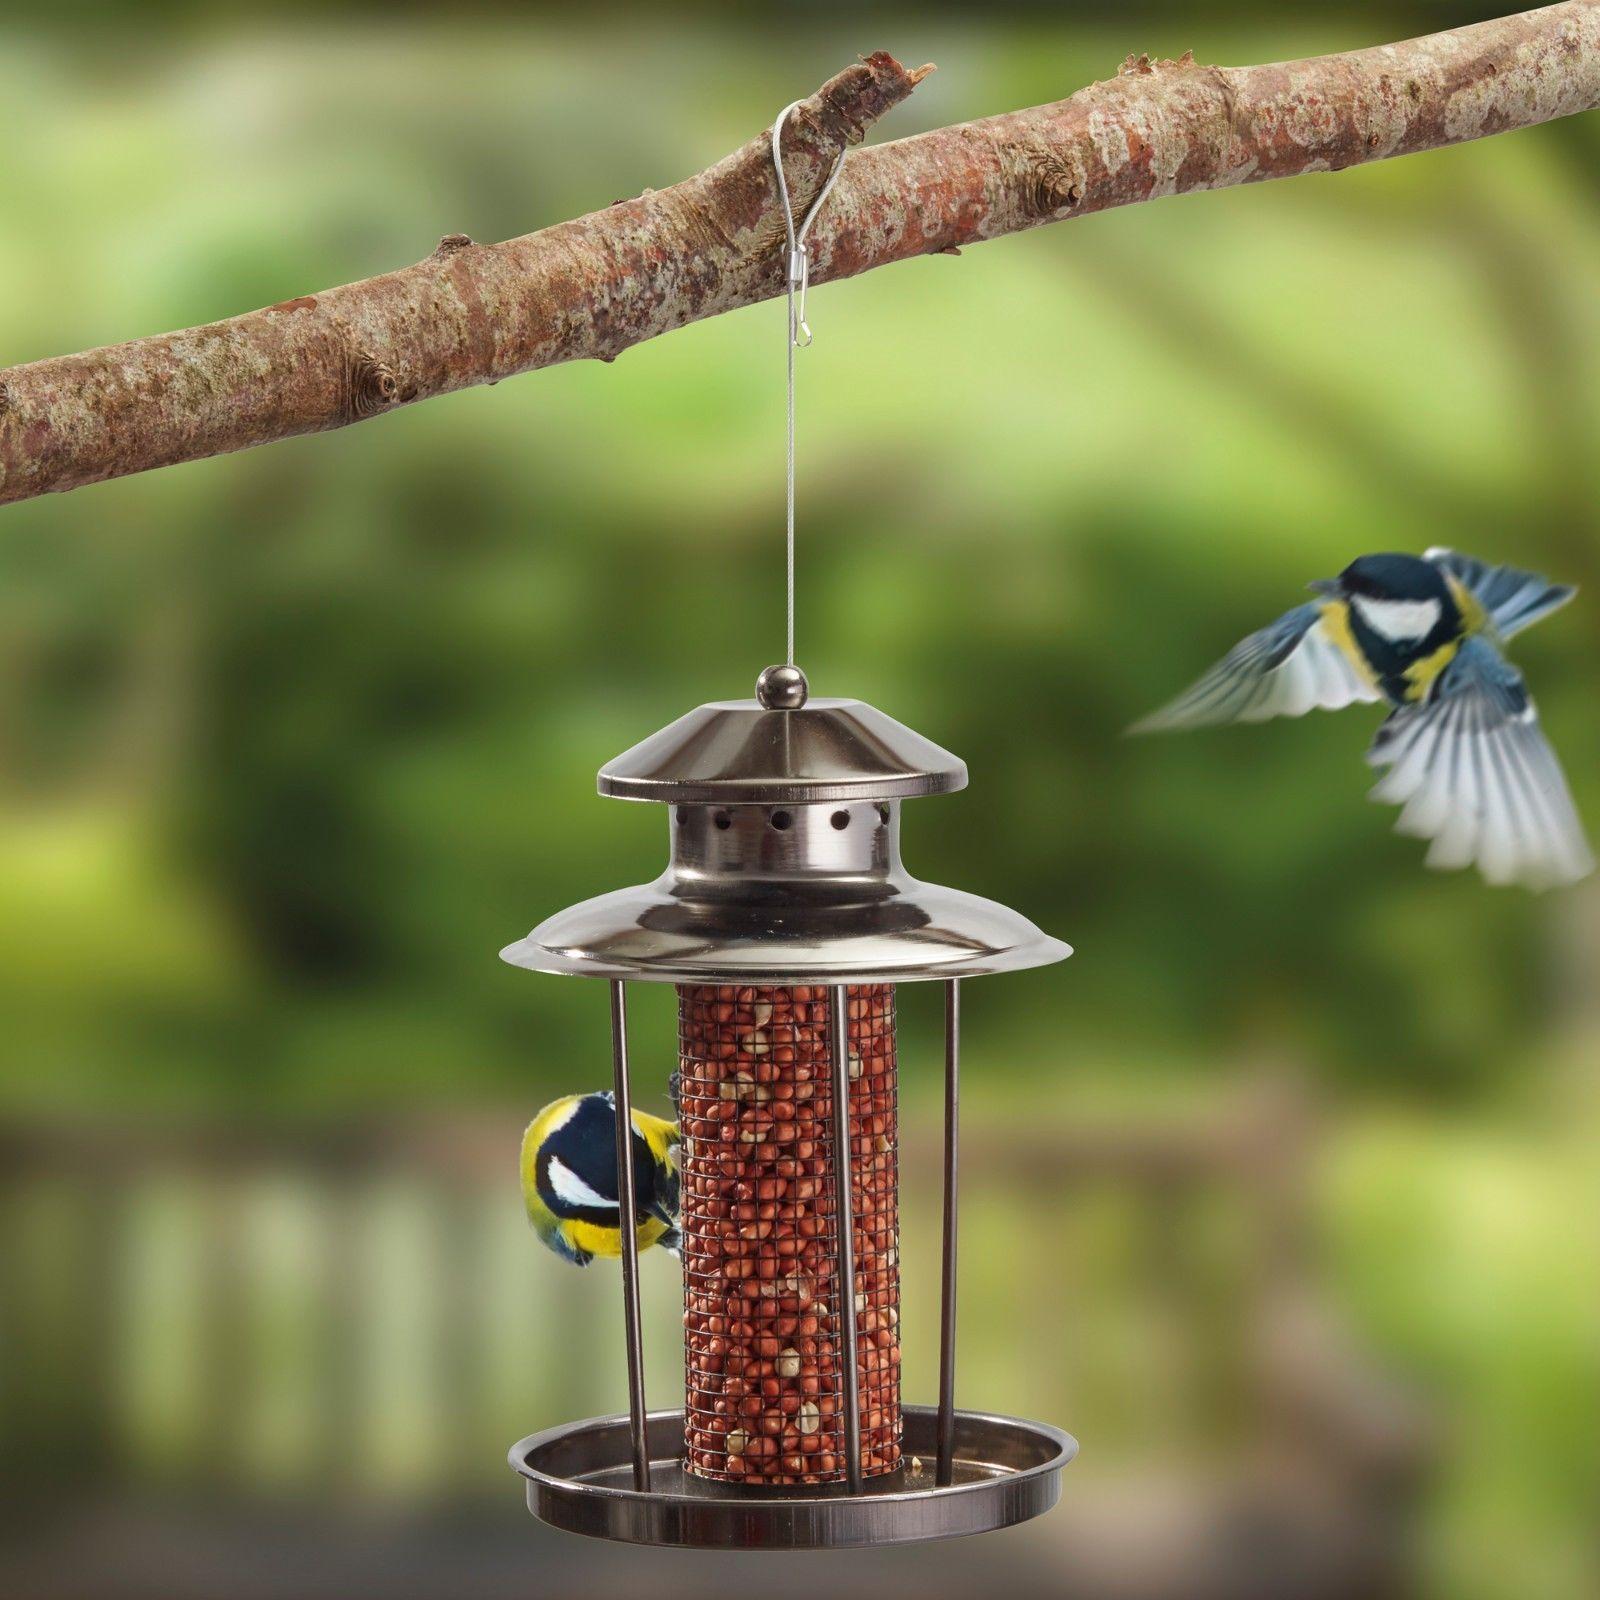 Happy Beaks SUPA X-1 Squirrel Proof Wild Bird Feeder Hanging Feeding Station for Garden Birds